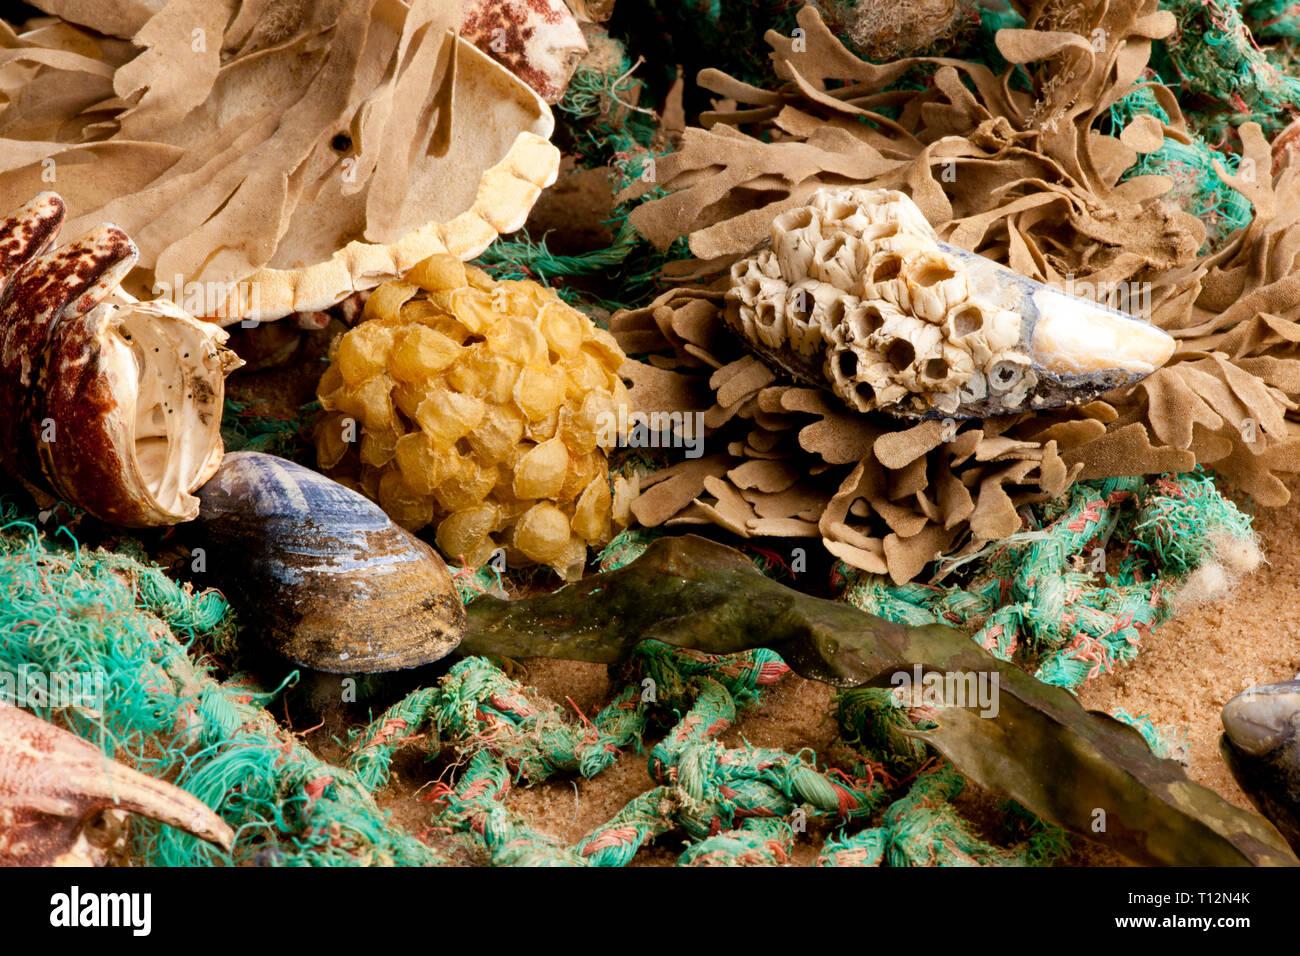 Flotsam and jetsam on a beach - Stock Image